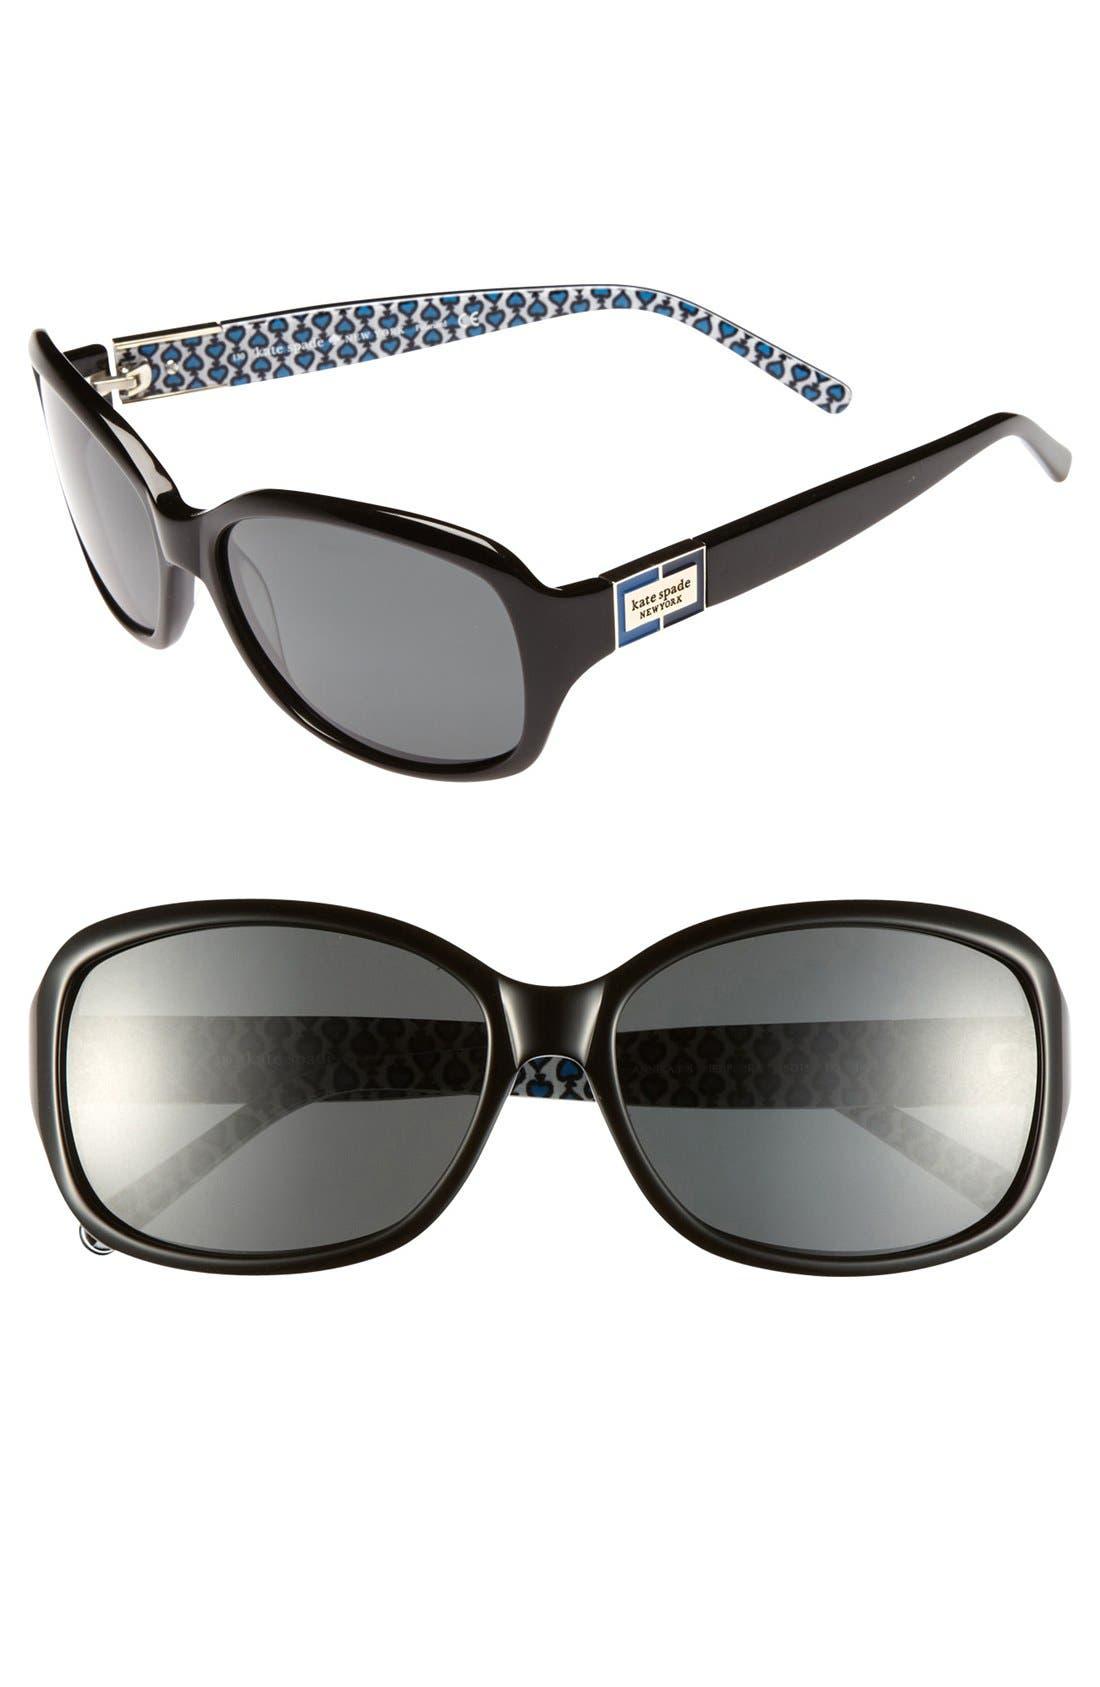 Main Image - kate spade new york annika/p/s 56mm polarized sunglasses